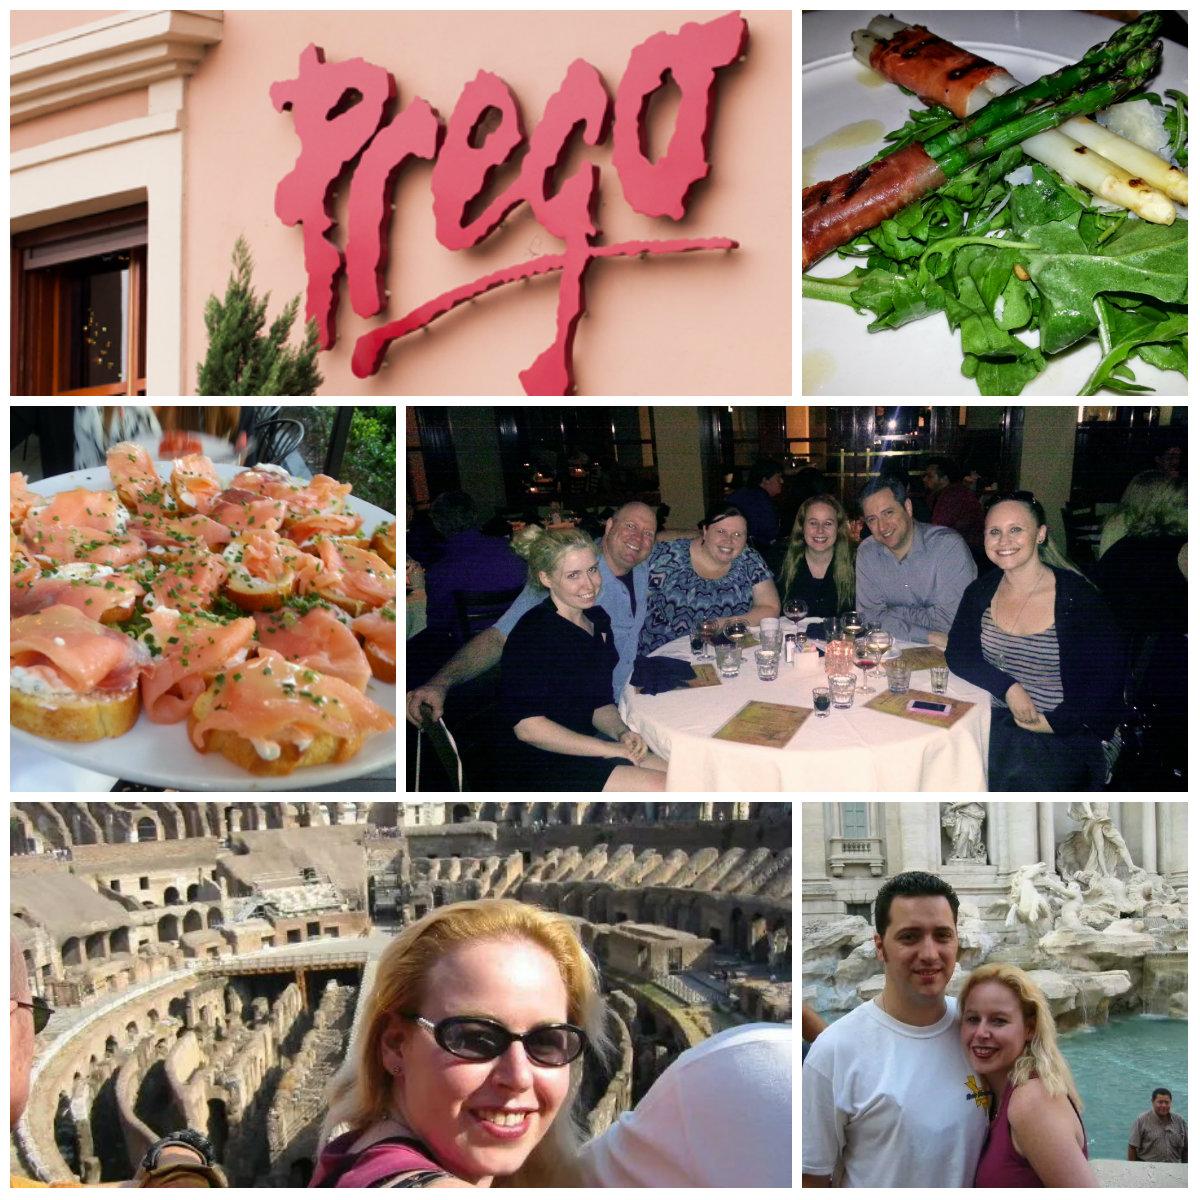 prego restaurant, irvine, foodies, orange county